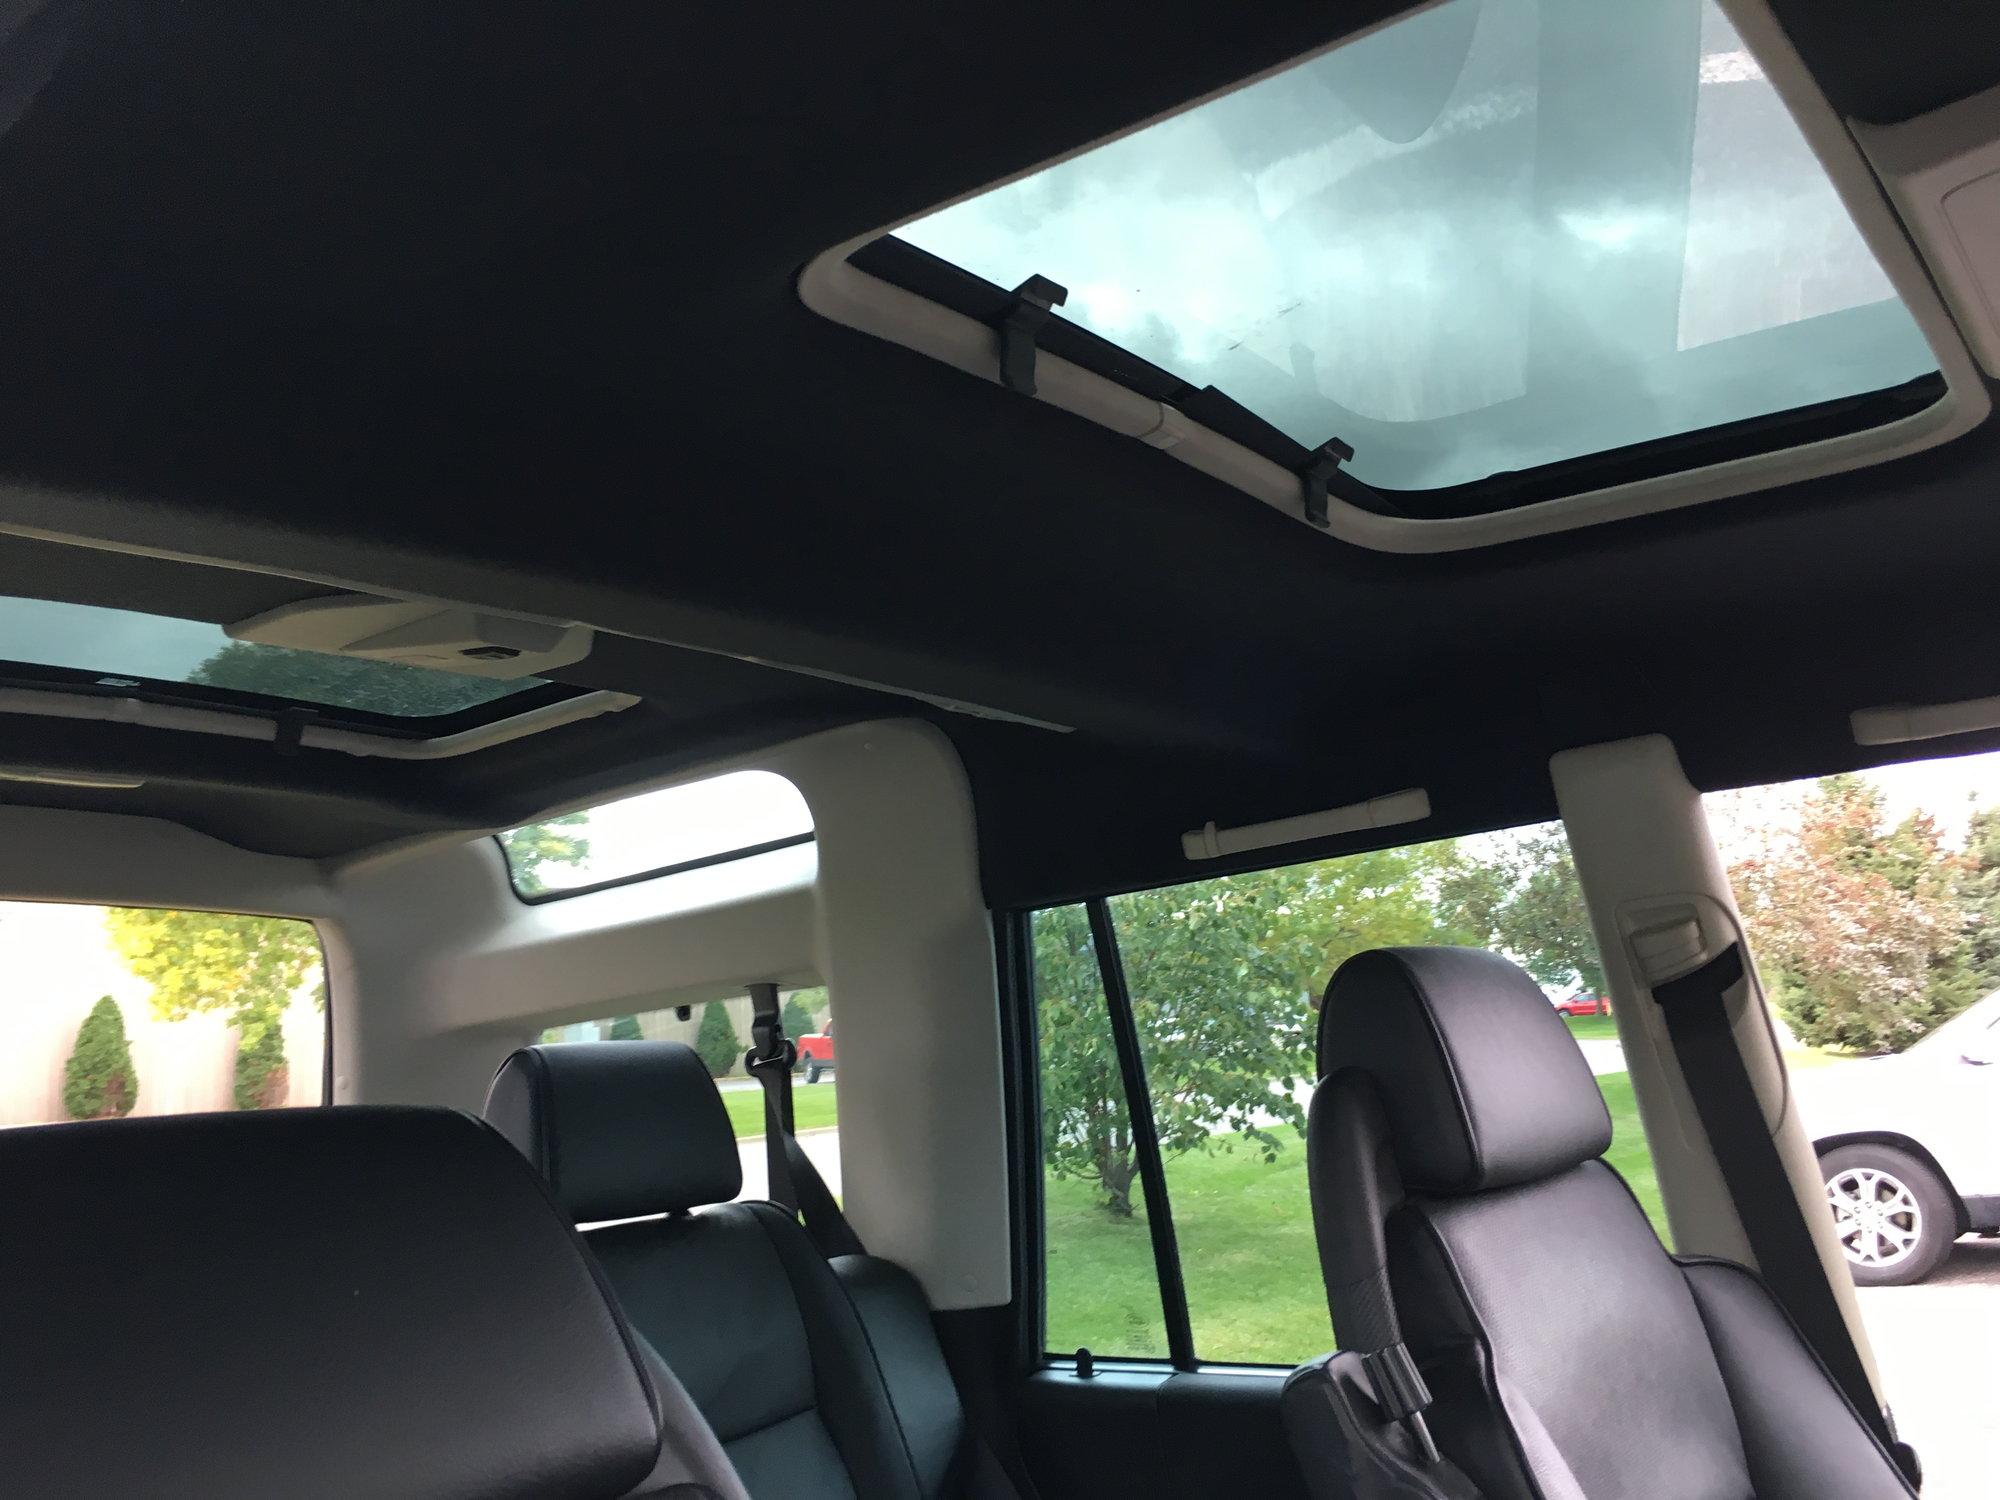 Land Rover Discovery Sunroof Drain Plastics 2 sets